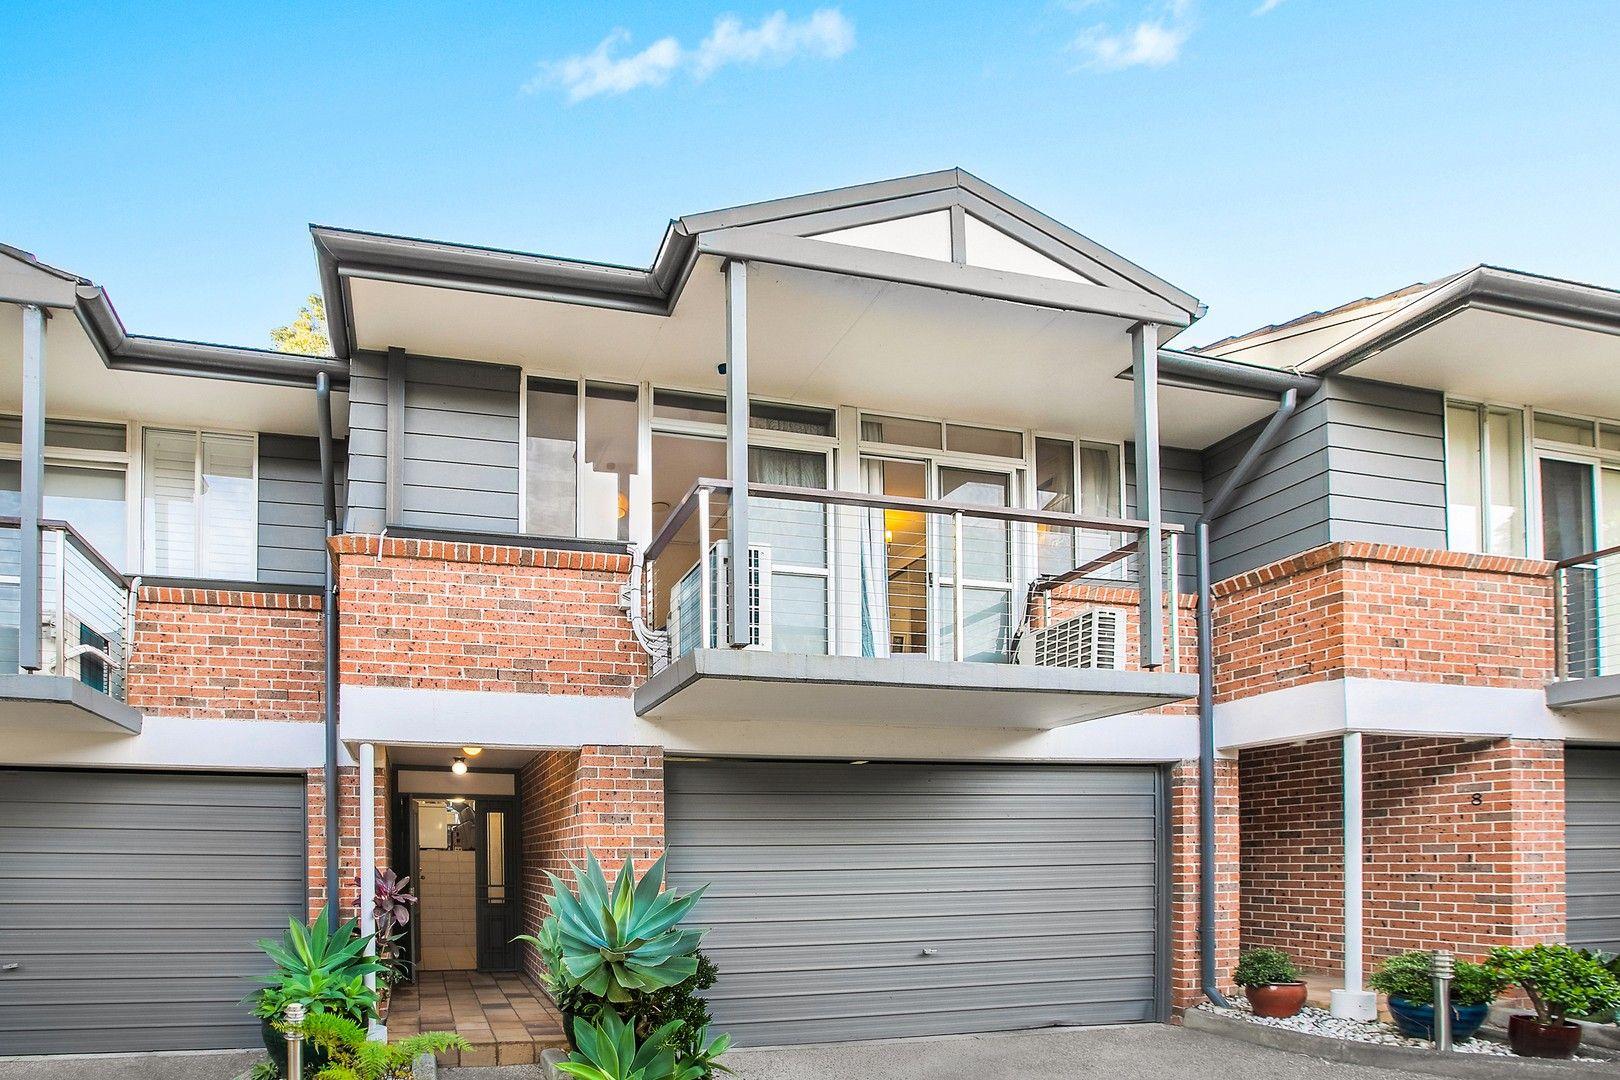 7/65-67 Finlayson Street, Lane Cove NSW 2066, Image 0